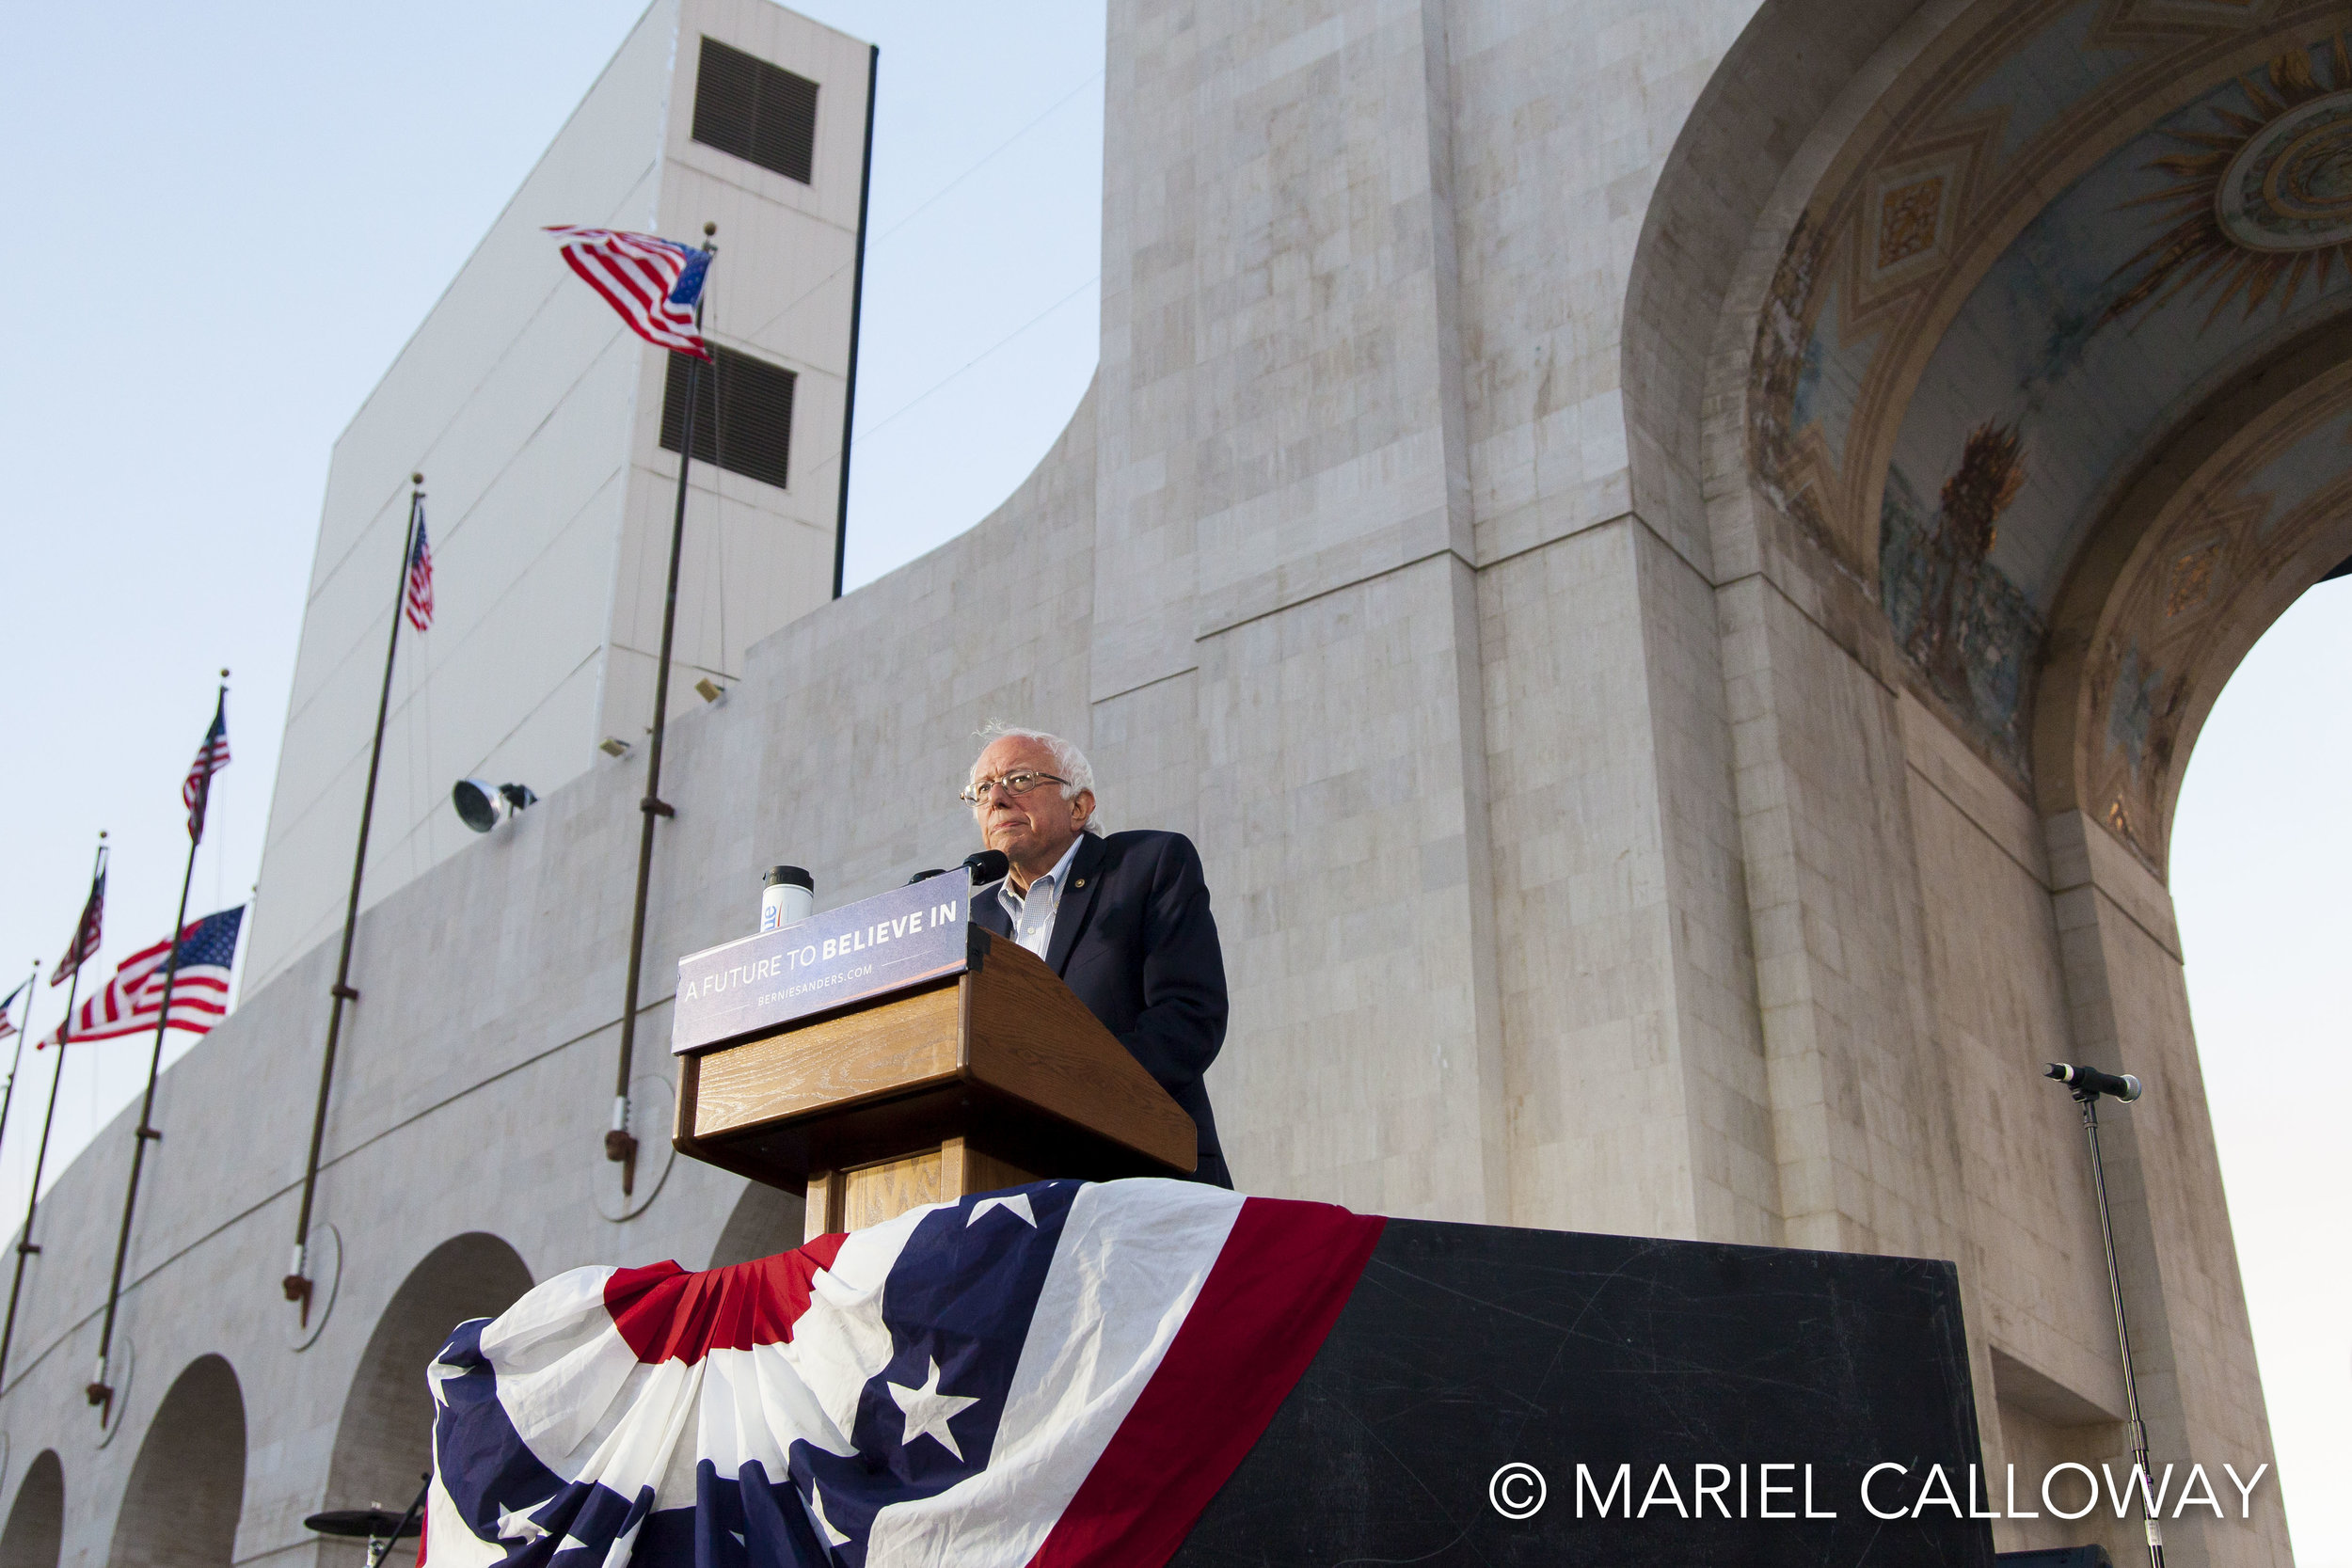 Bernie-Sanders-Mariel-Calloway-LA-Coliseum-10.jpg